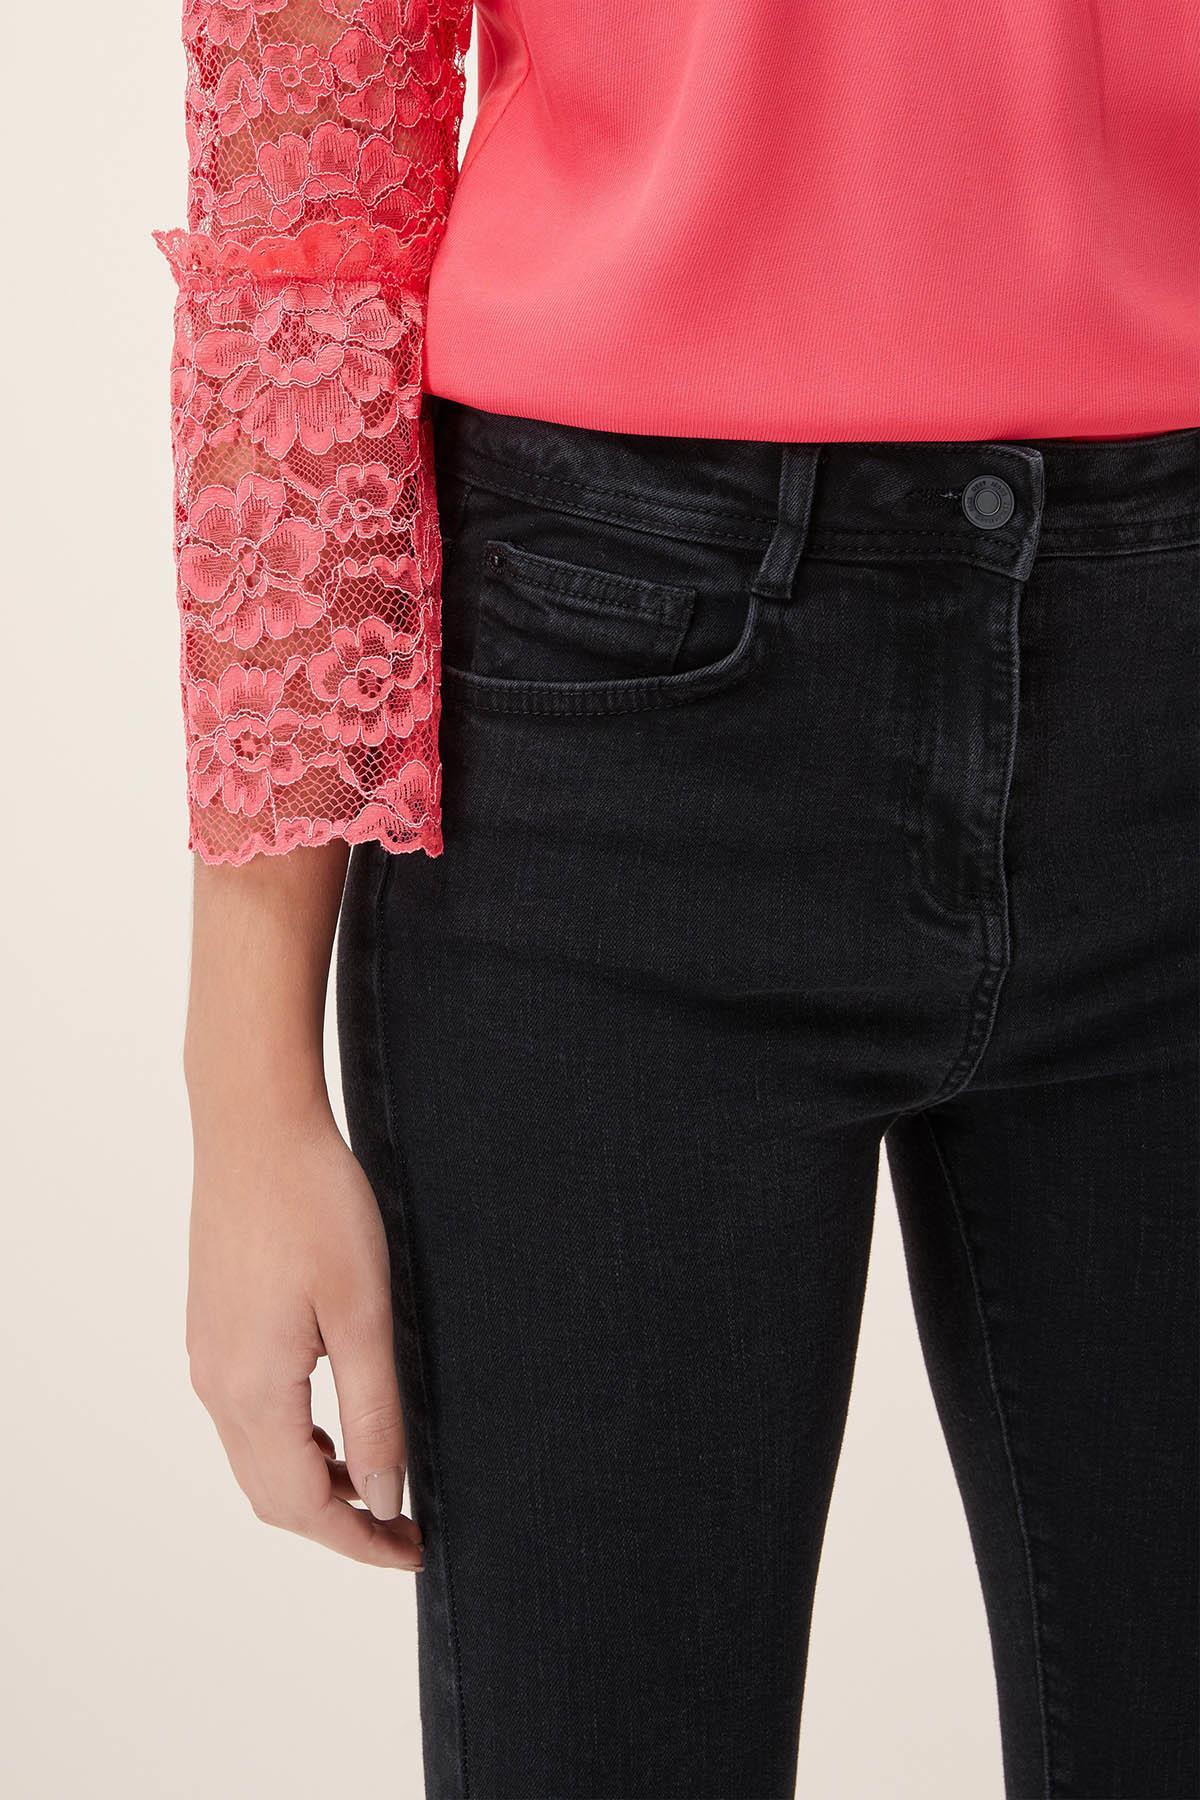 Ladies-Skinny-Jeans-New-ex-Next-Extra-Stretch-Size-6-18-Short-Reg-X-Long-Tall thumbnail 12